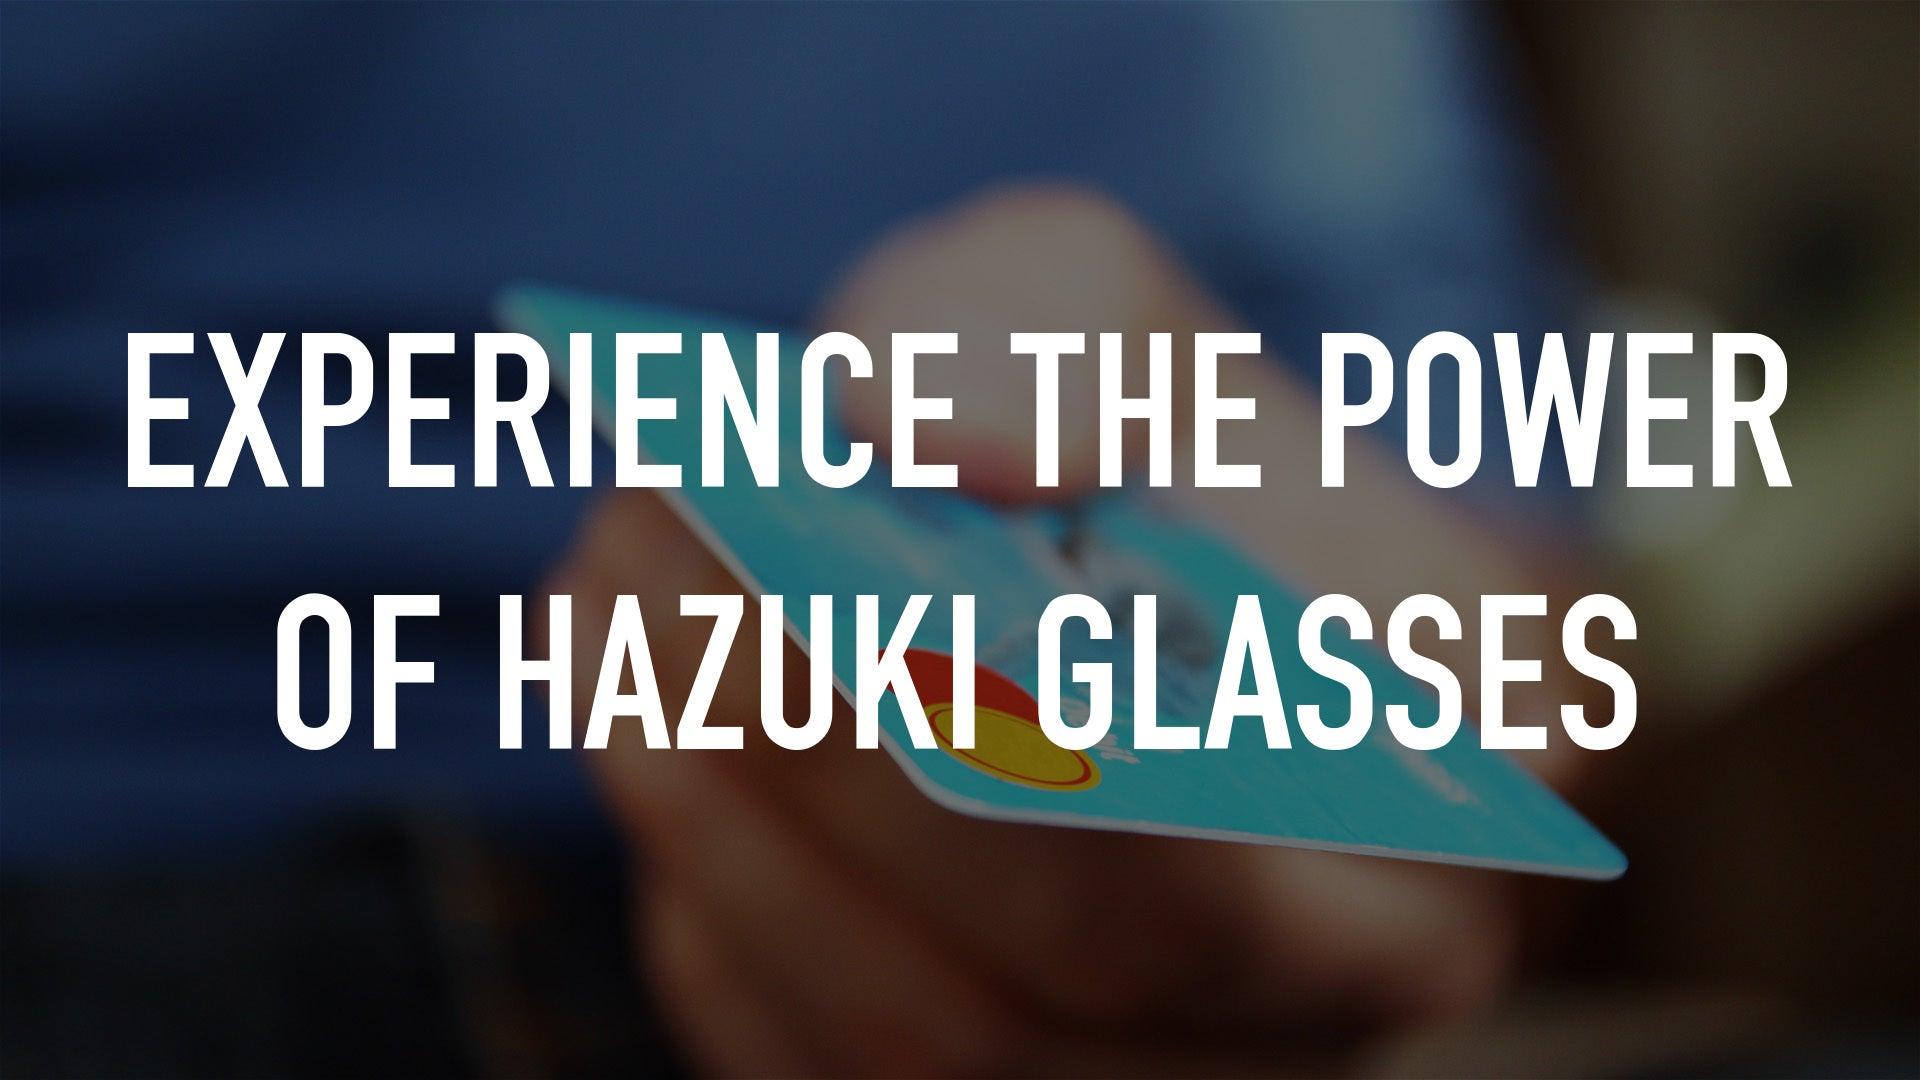 Experience the Power of Hazuki Glasses